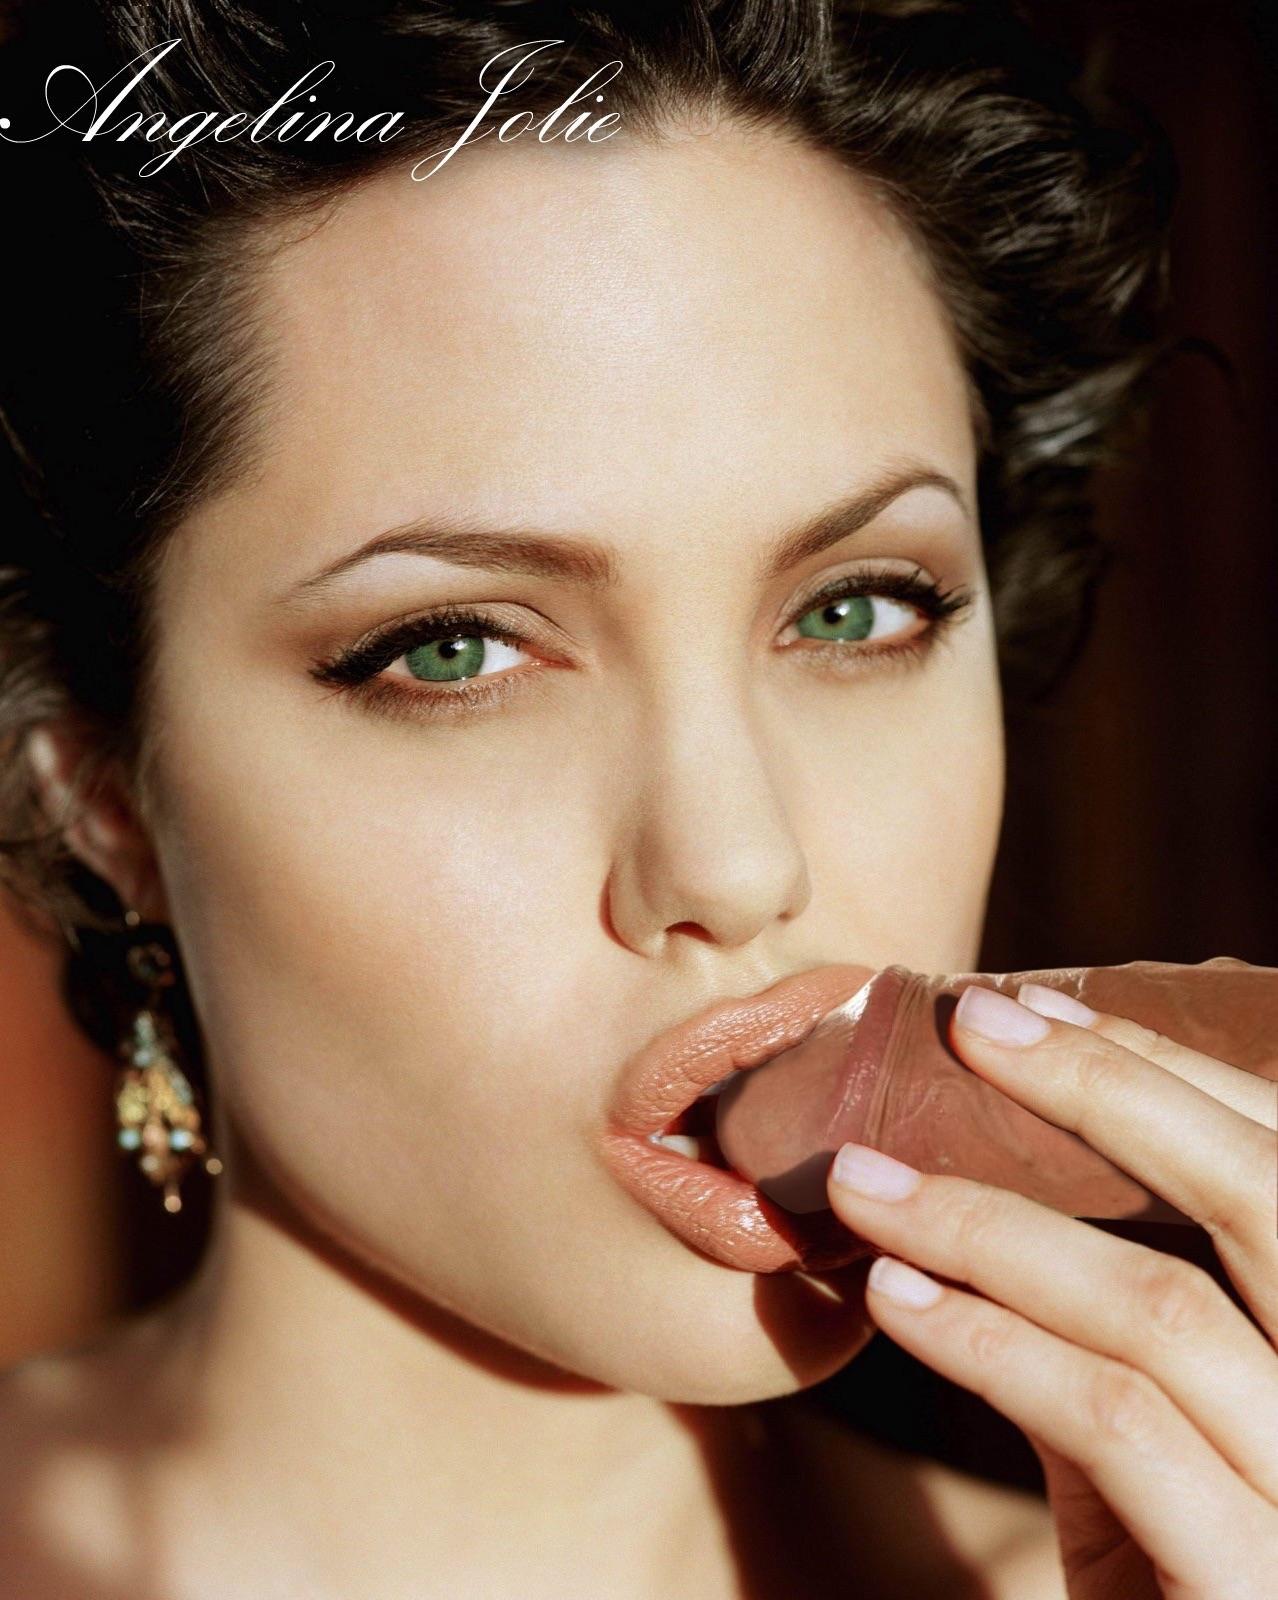 Angelina jolie sucking dick